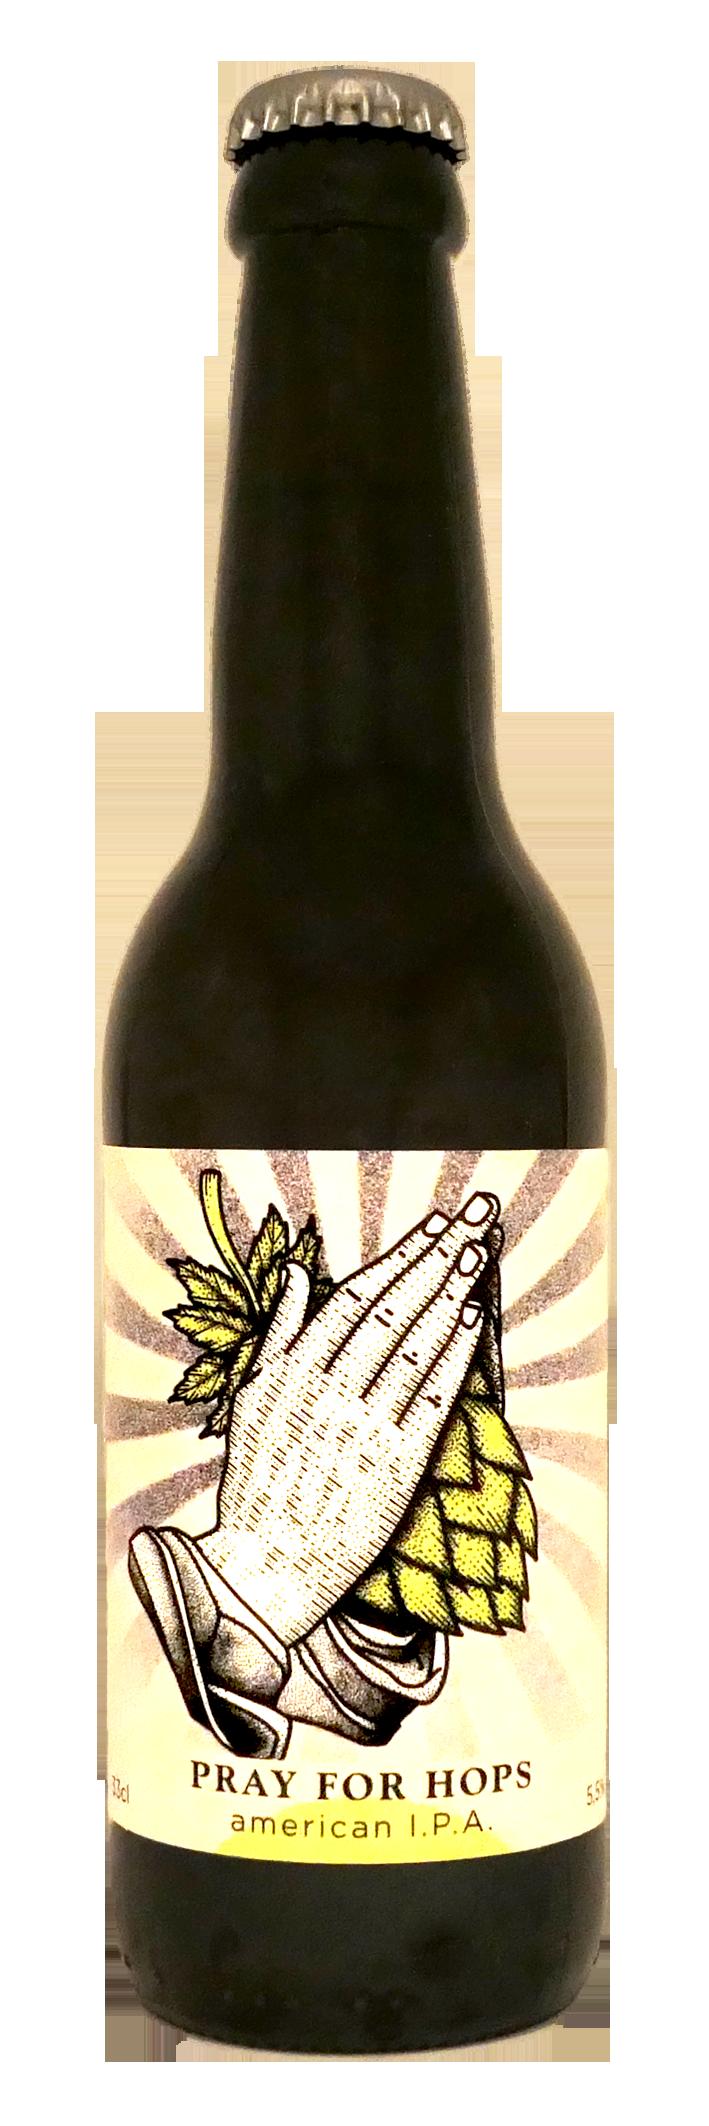 Arav - Pray for hops - IPA